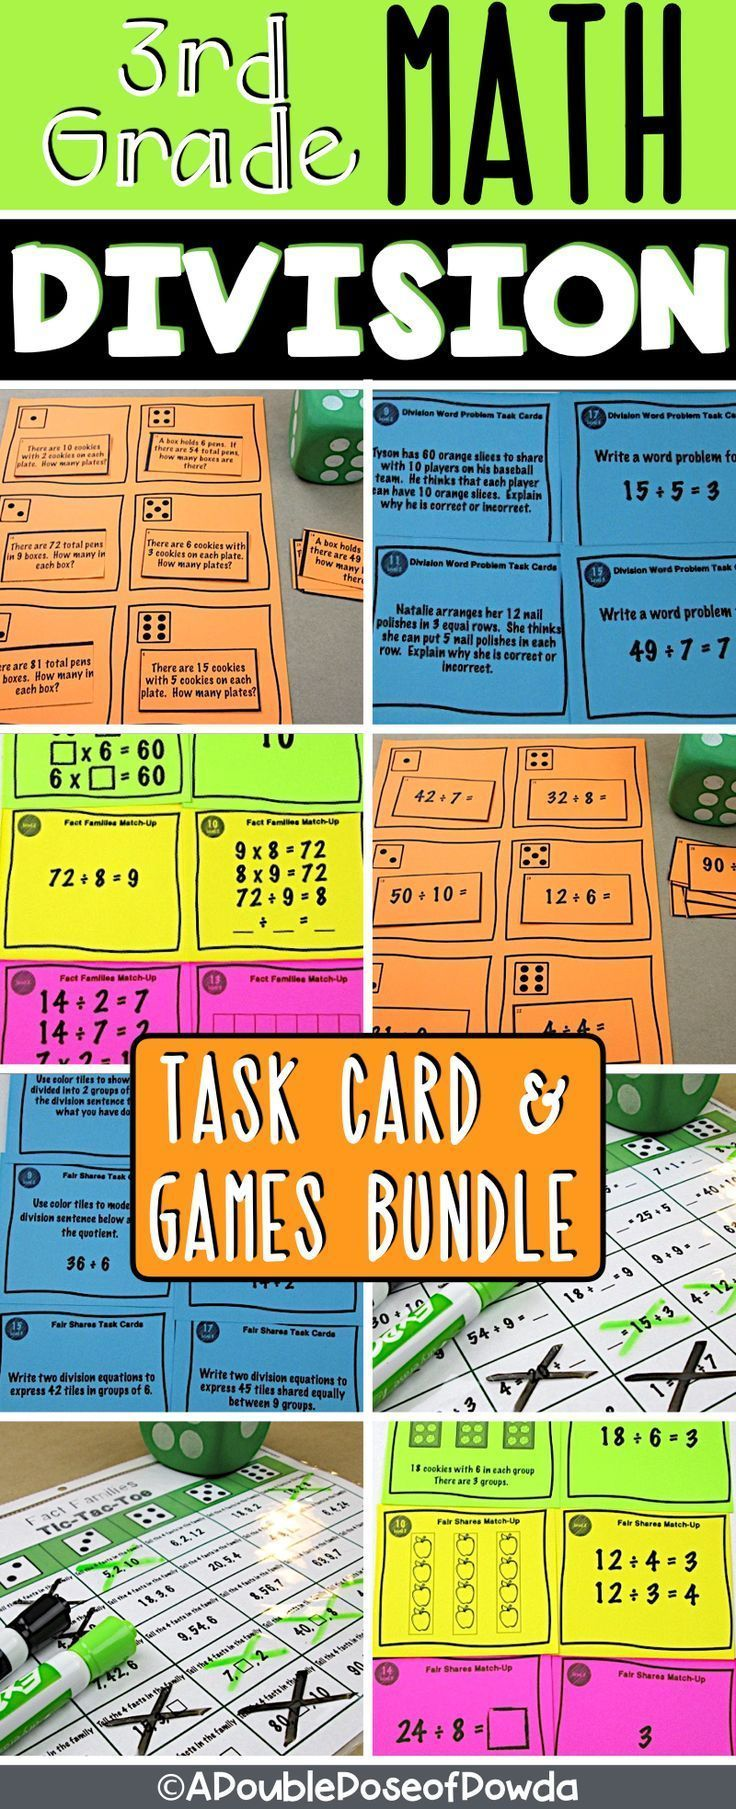 Basic Division Centers & Games Bundle Elementary math